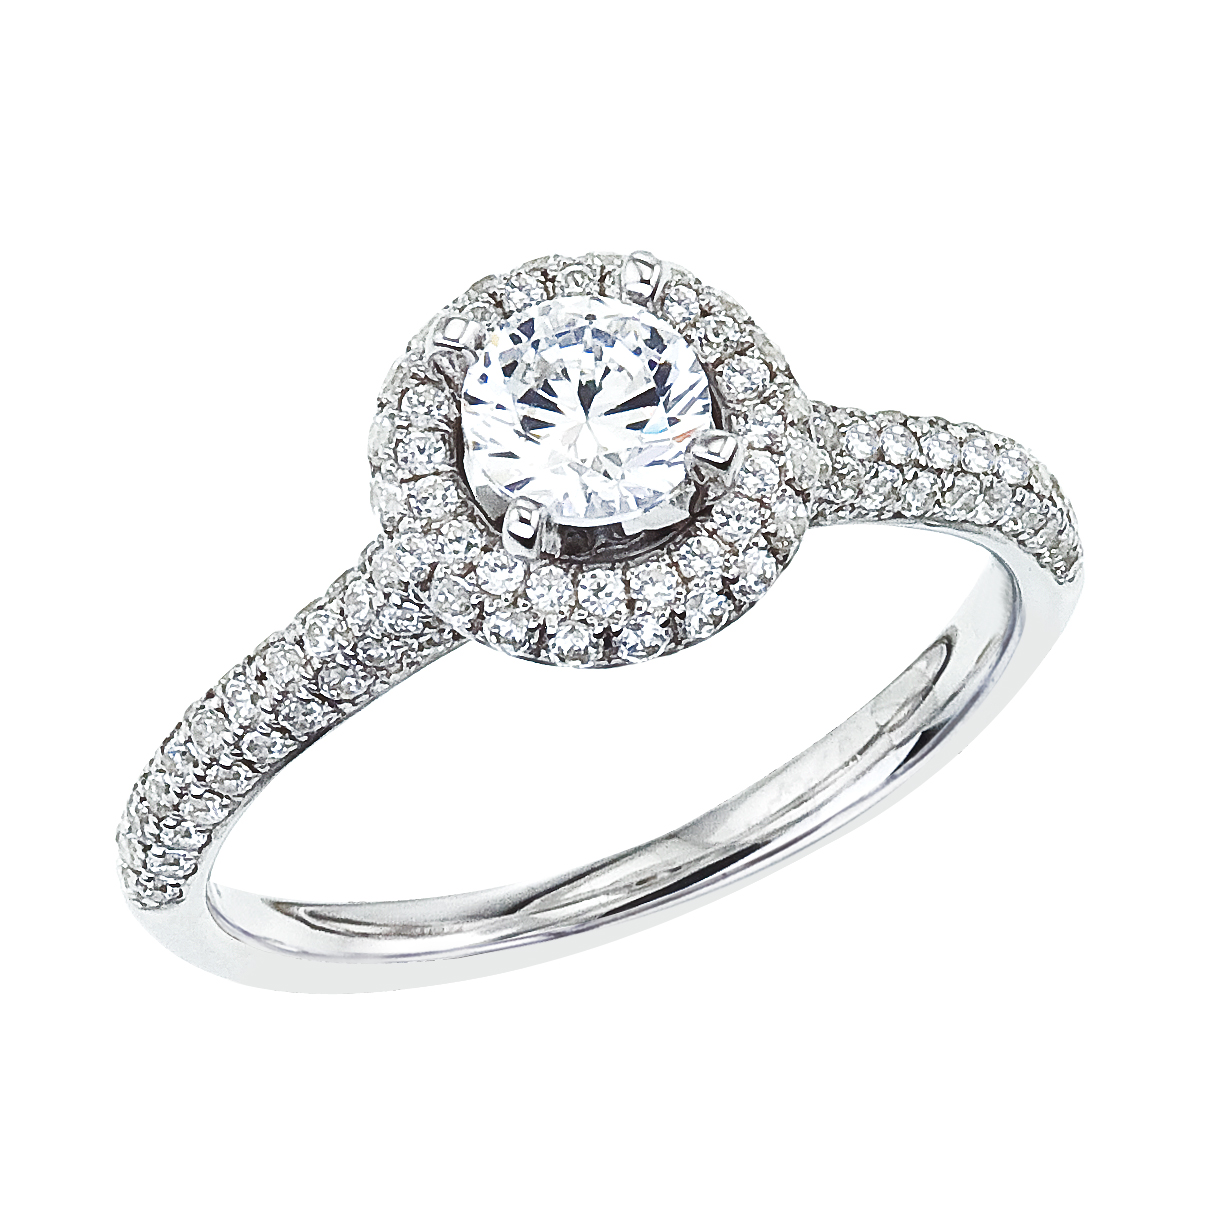 14k White gold Classic Diamond QPID Engagement Ring (0.85 tcw)